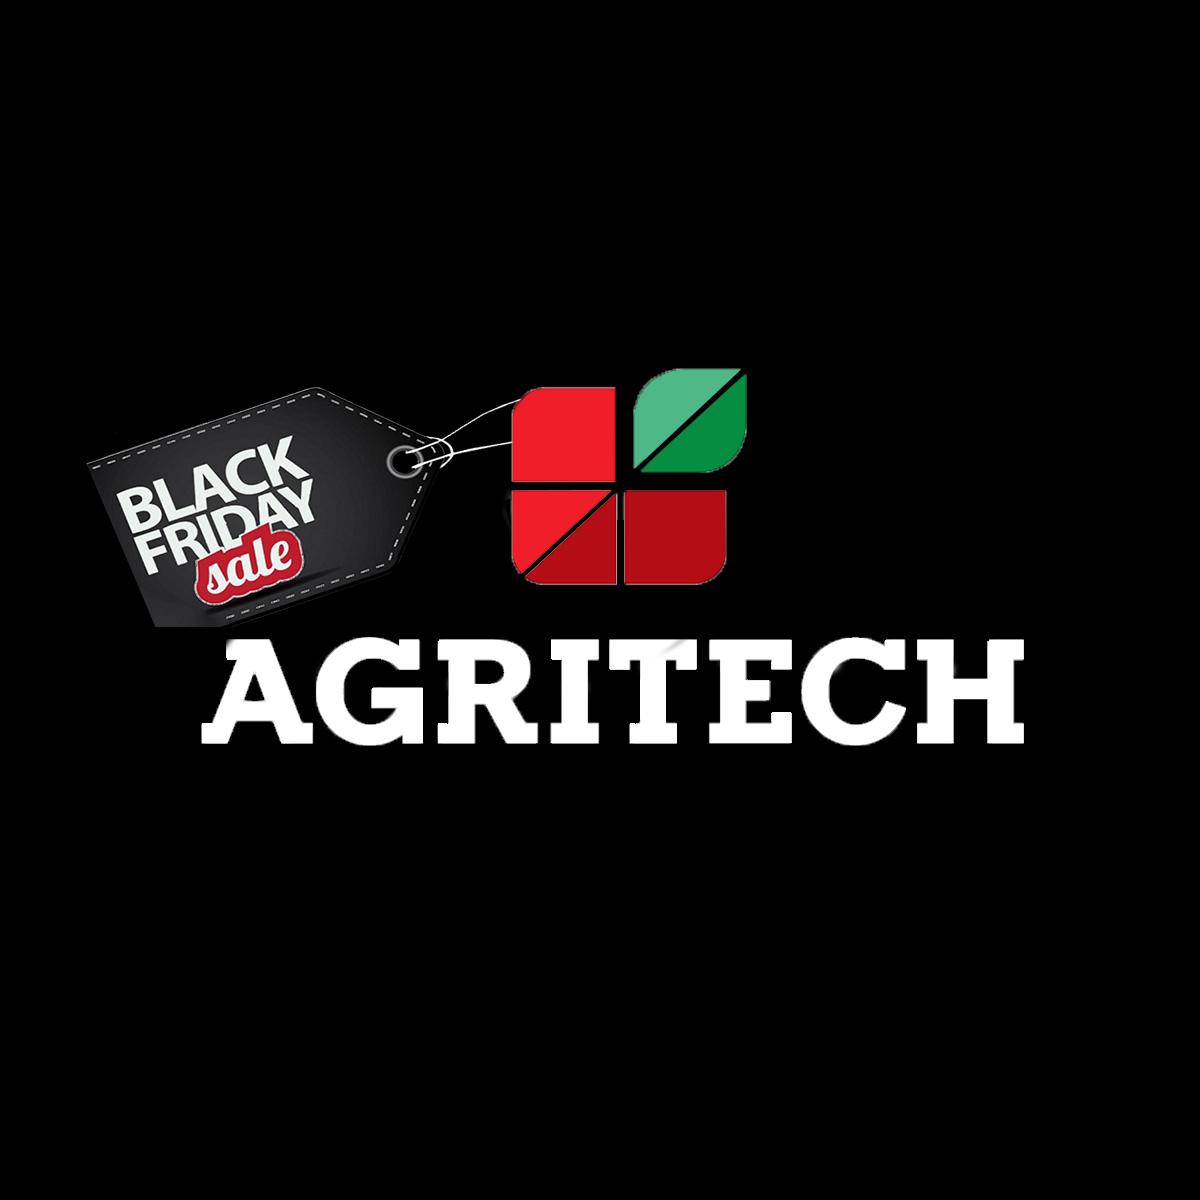 News Black Friday Agritech